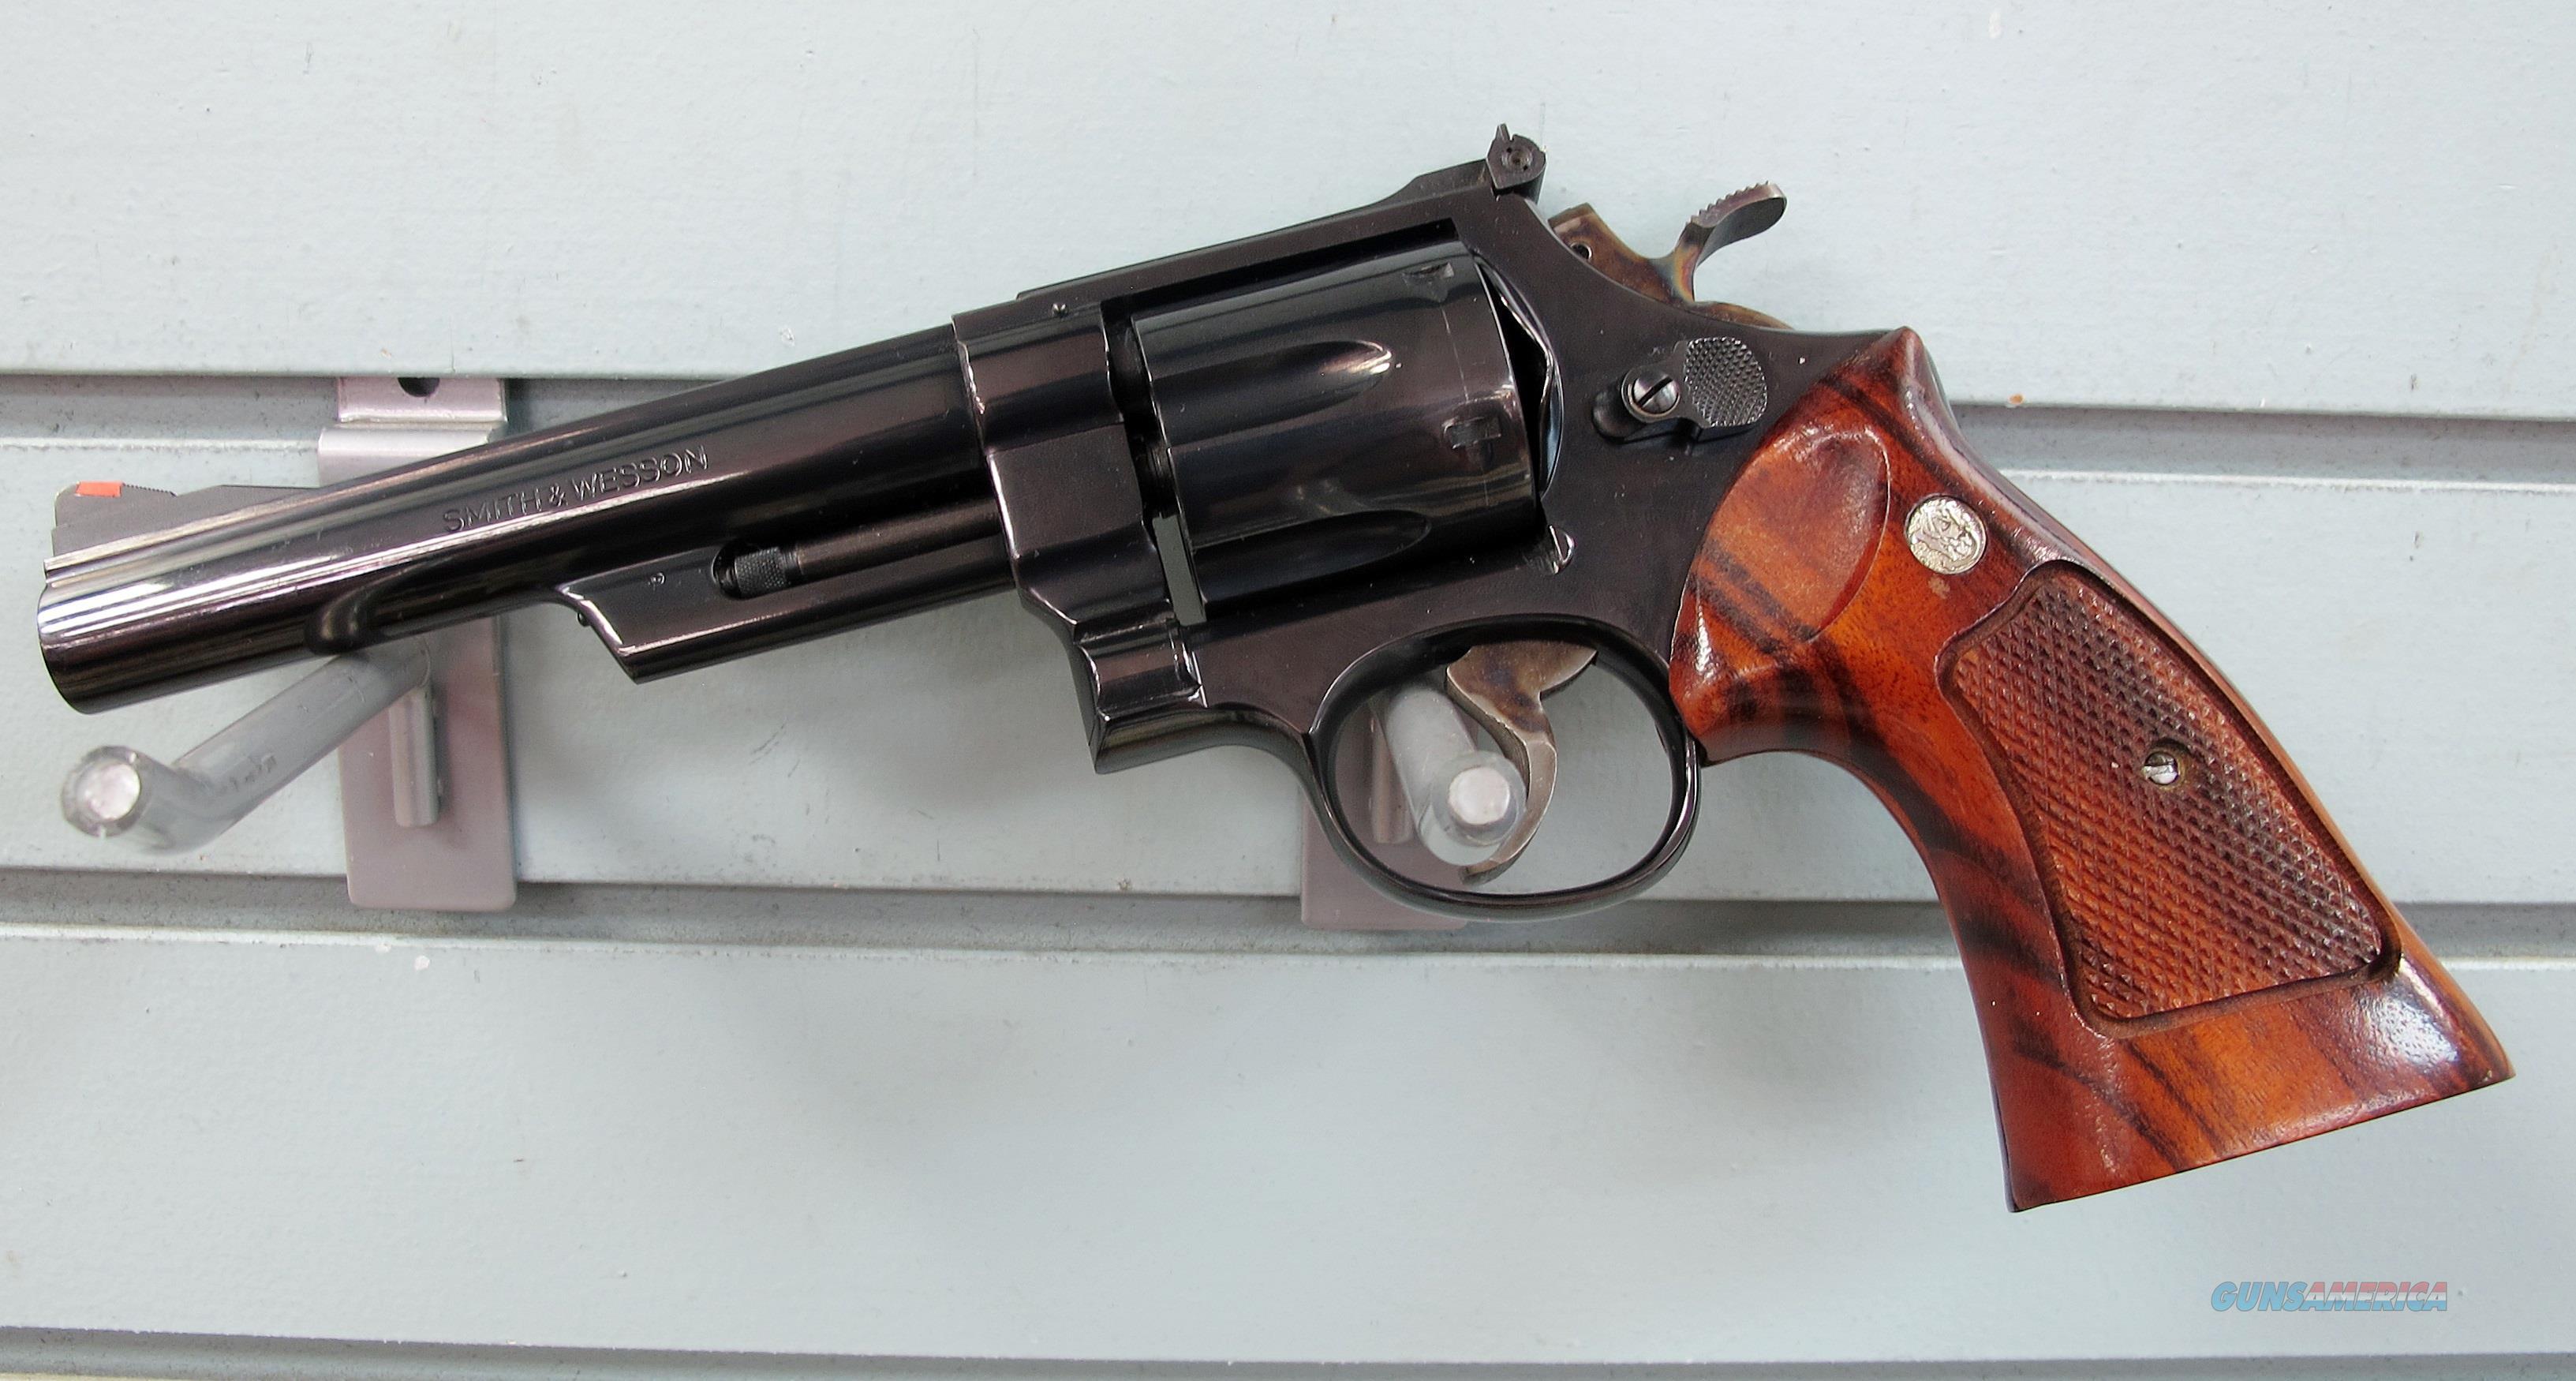 SMITH & WESSON 41 MAG MODEL 57 REVOLVER  Guns > Pistols > Smith & Wesson Revolvers > Full Frame Revolver